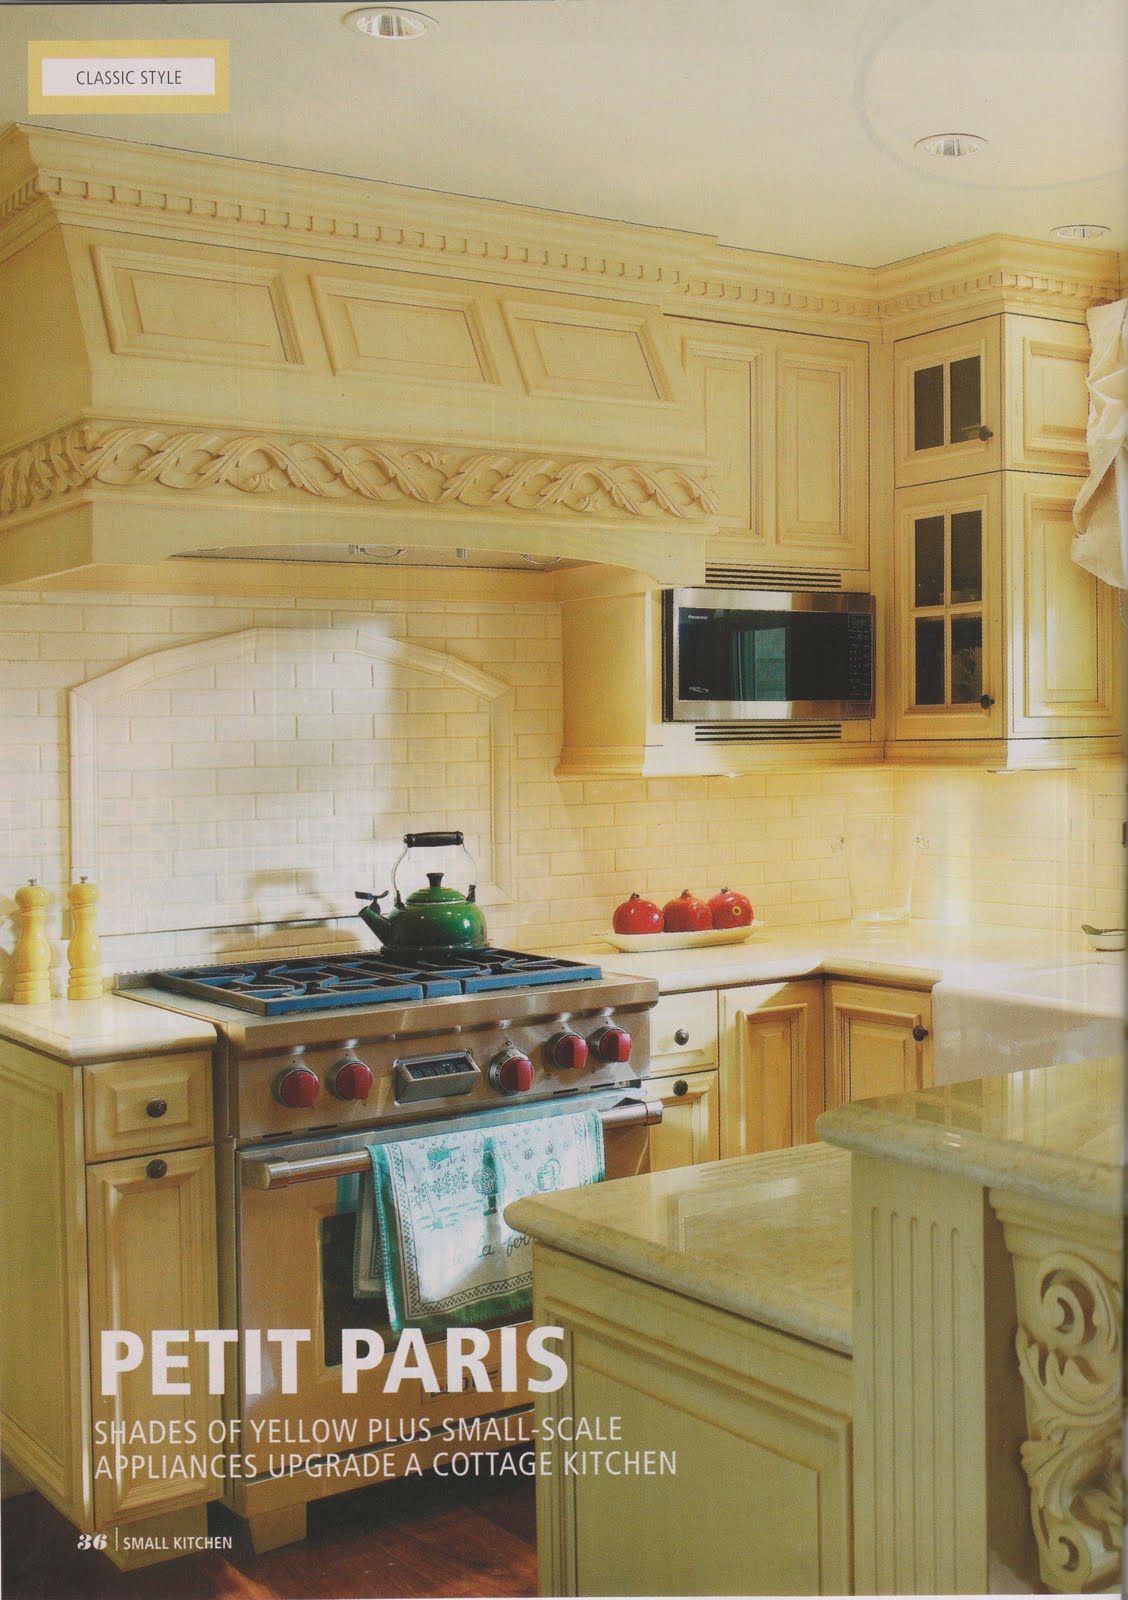 Green Interior Design + Healthy Living: Petit Paris: Shades of Yellow